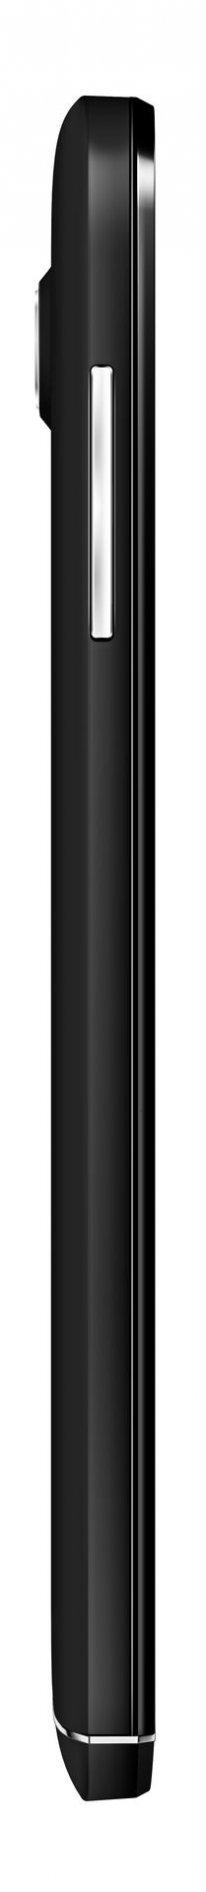 Wiko Slide Side Black